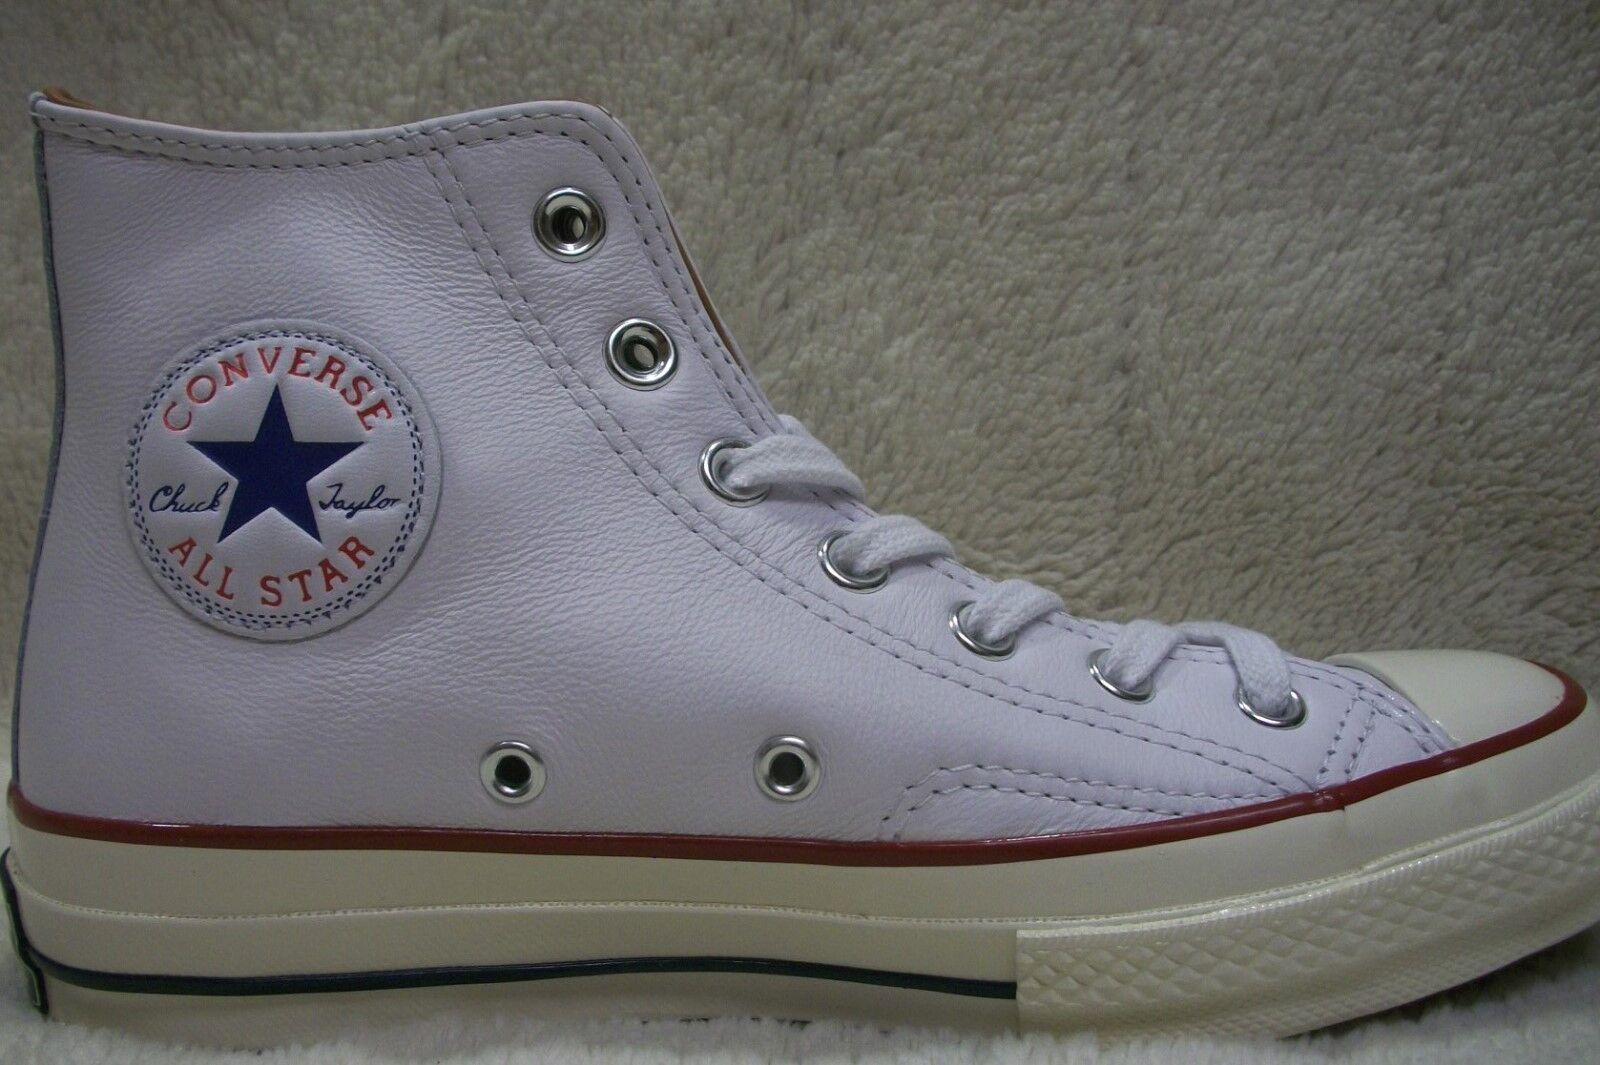 Converse CTAS Hi 1970 151154C White Leather Mens 5 - Womens 7